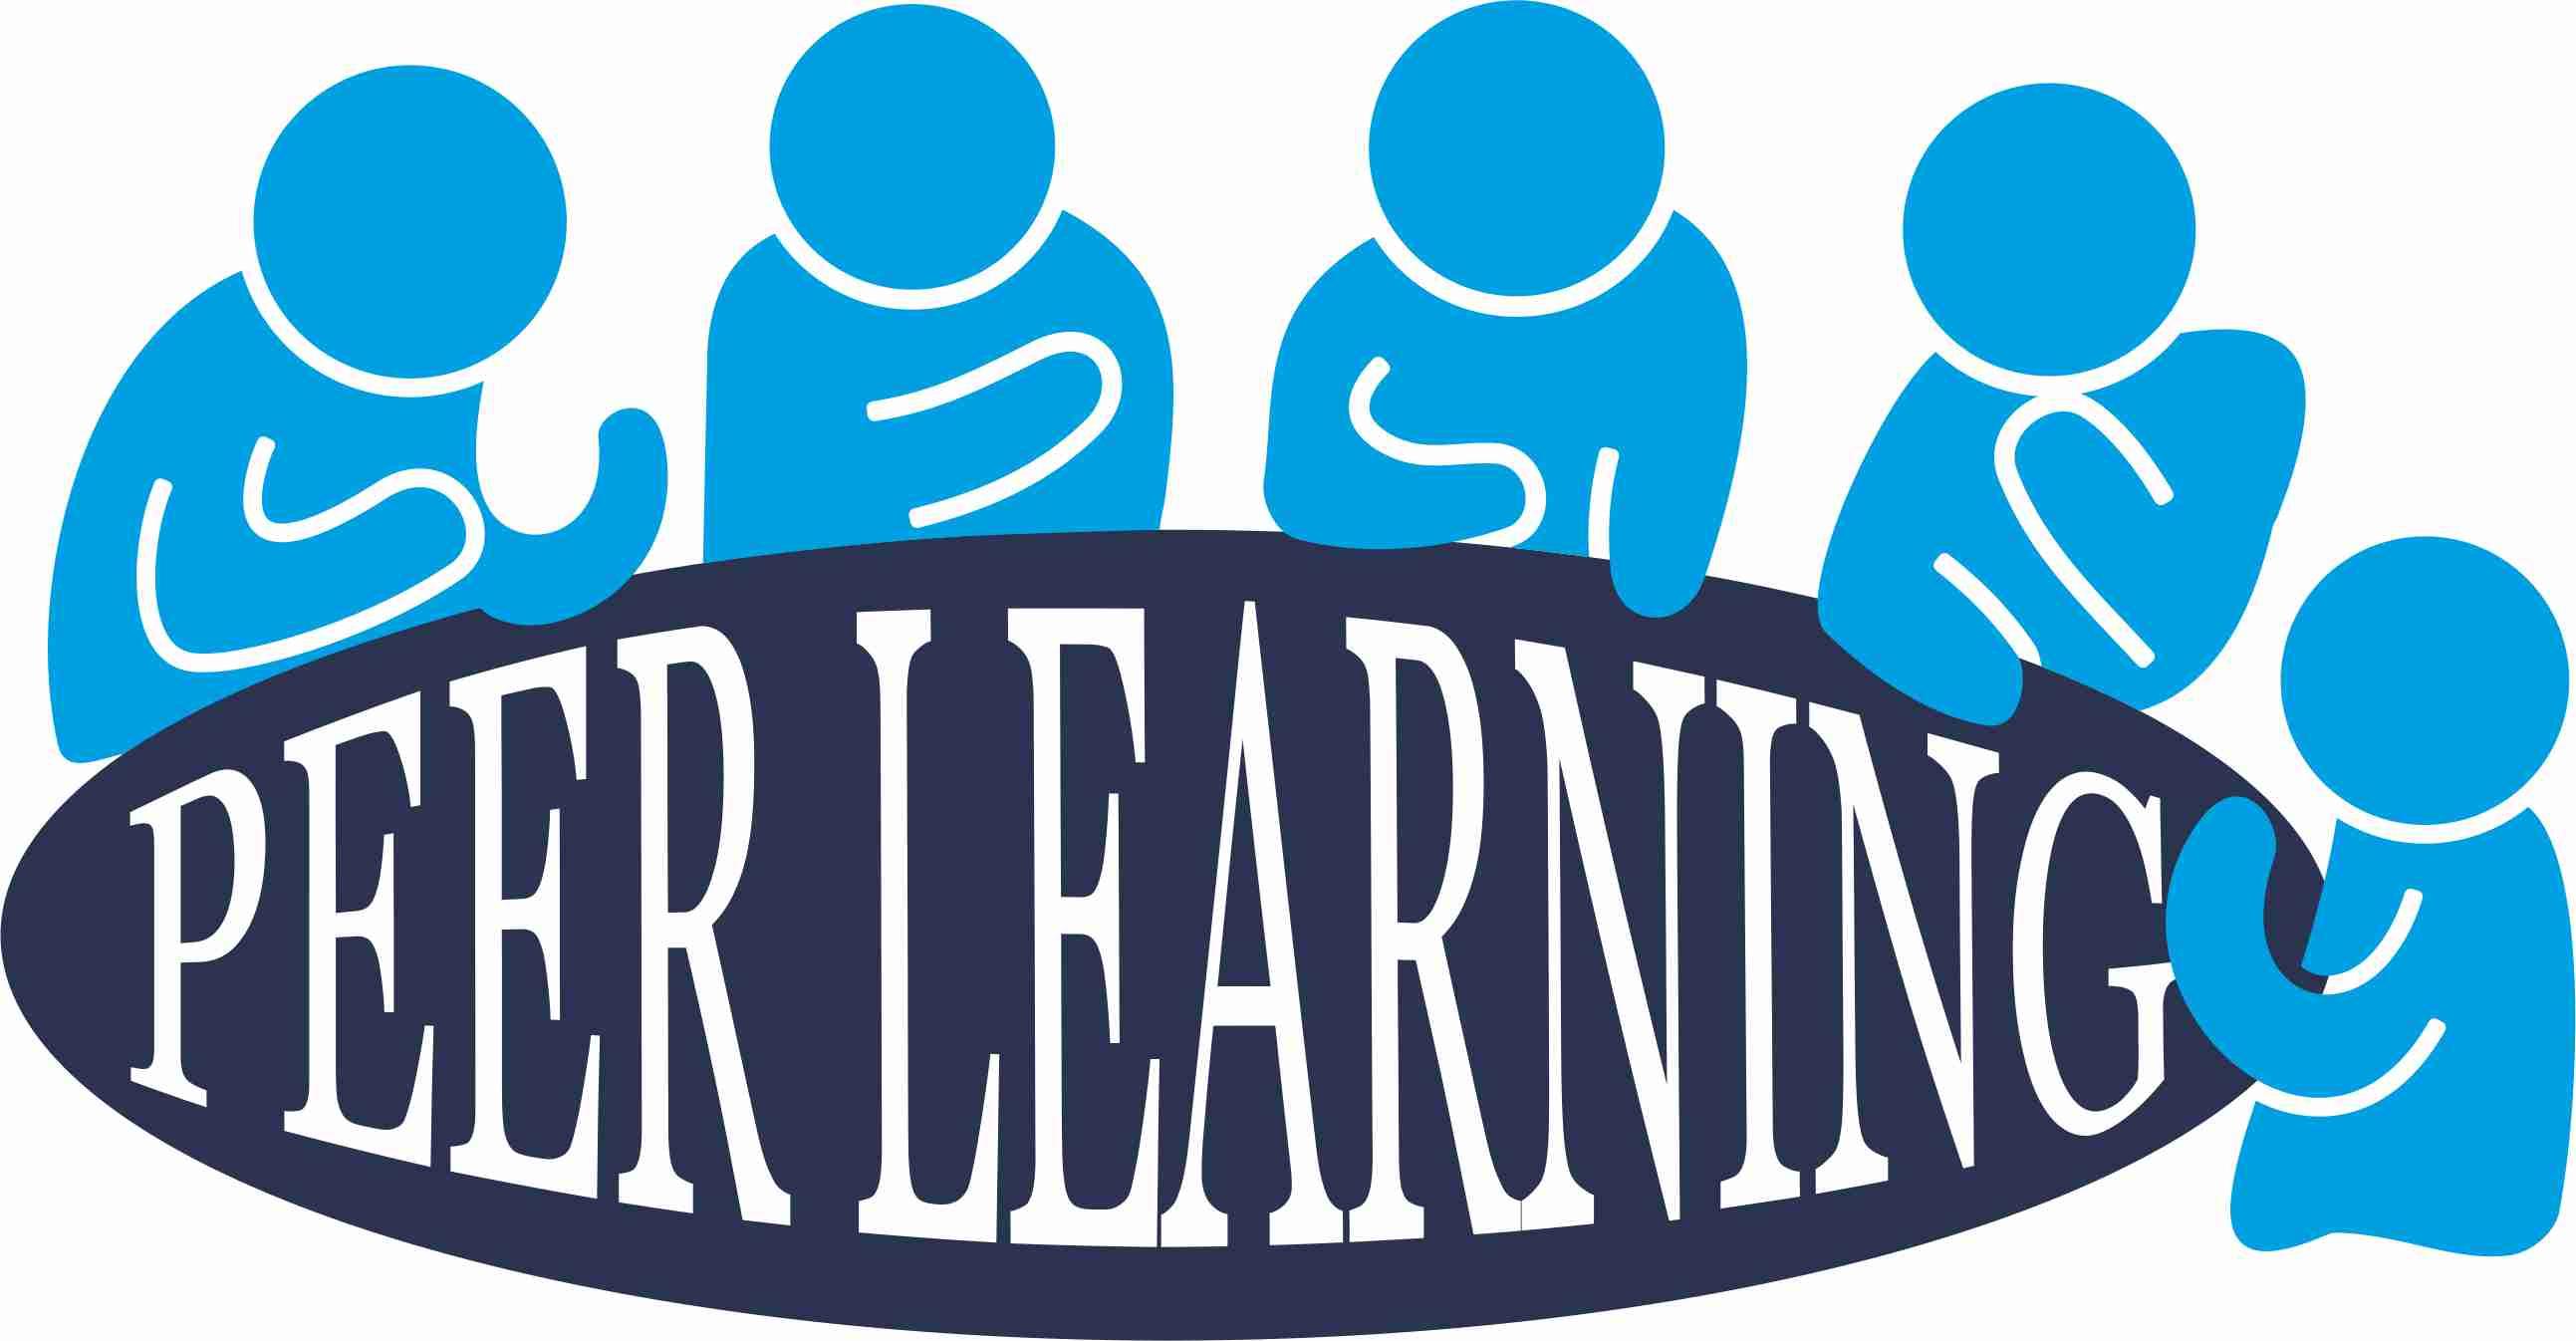 Generic University Logo Peer Learning | Any Ot...